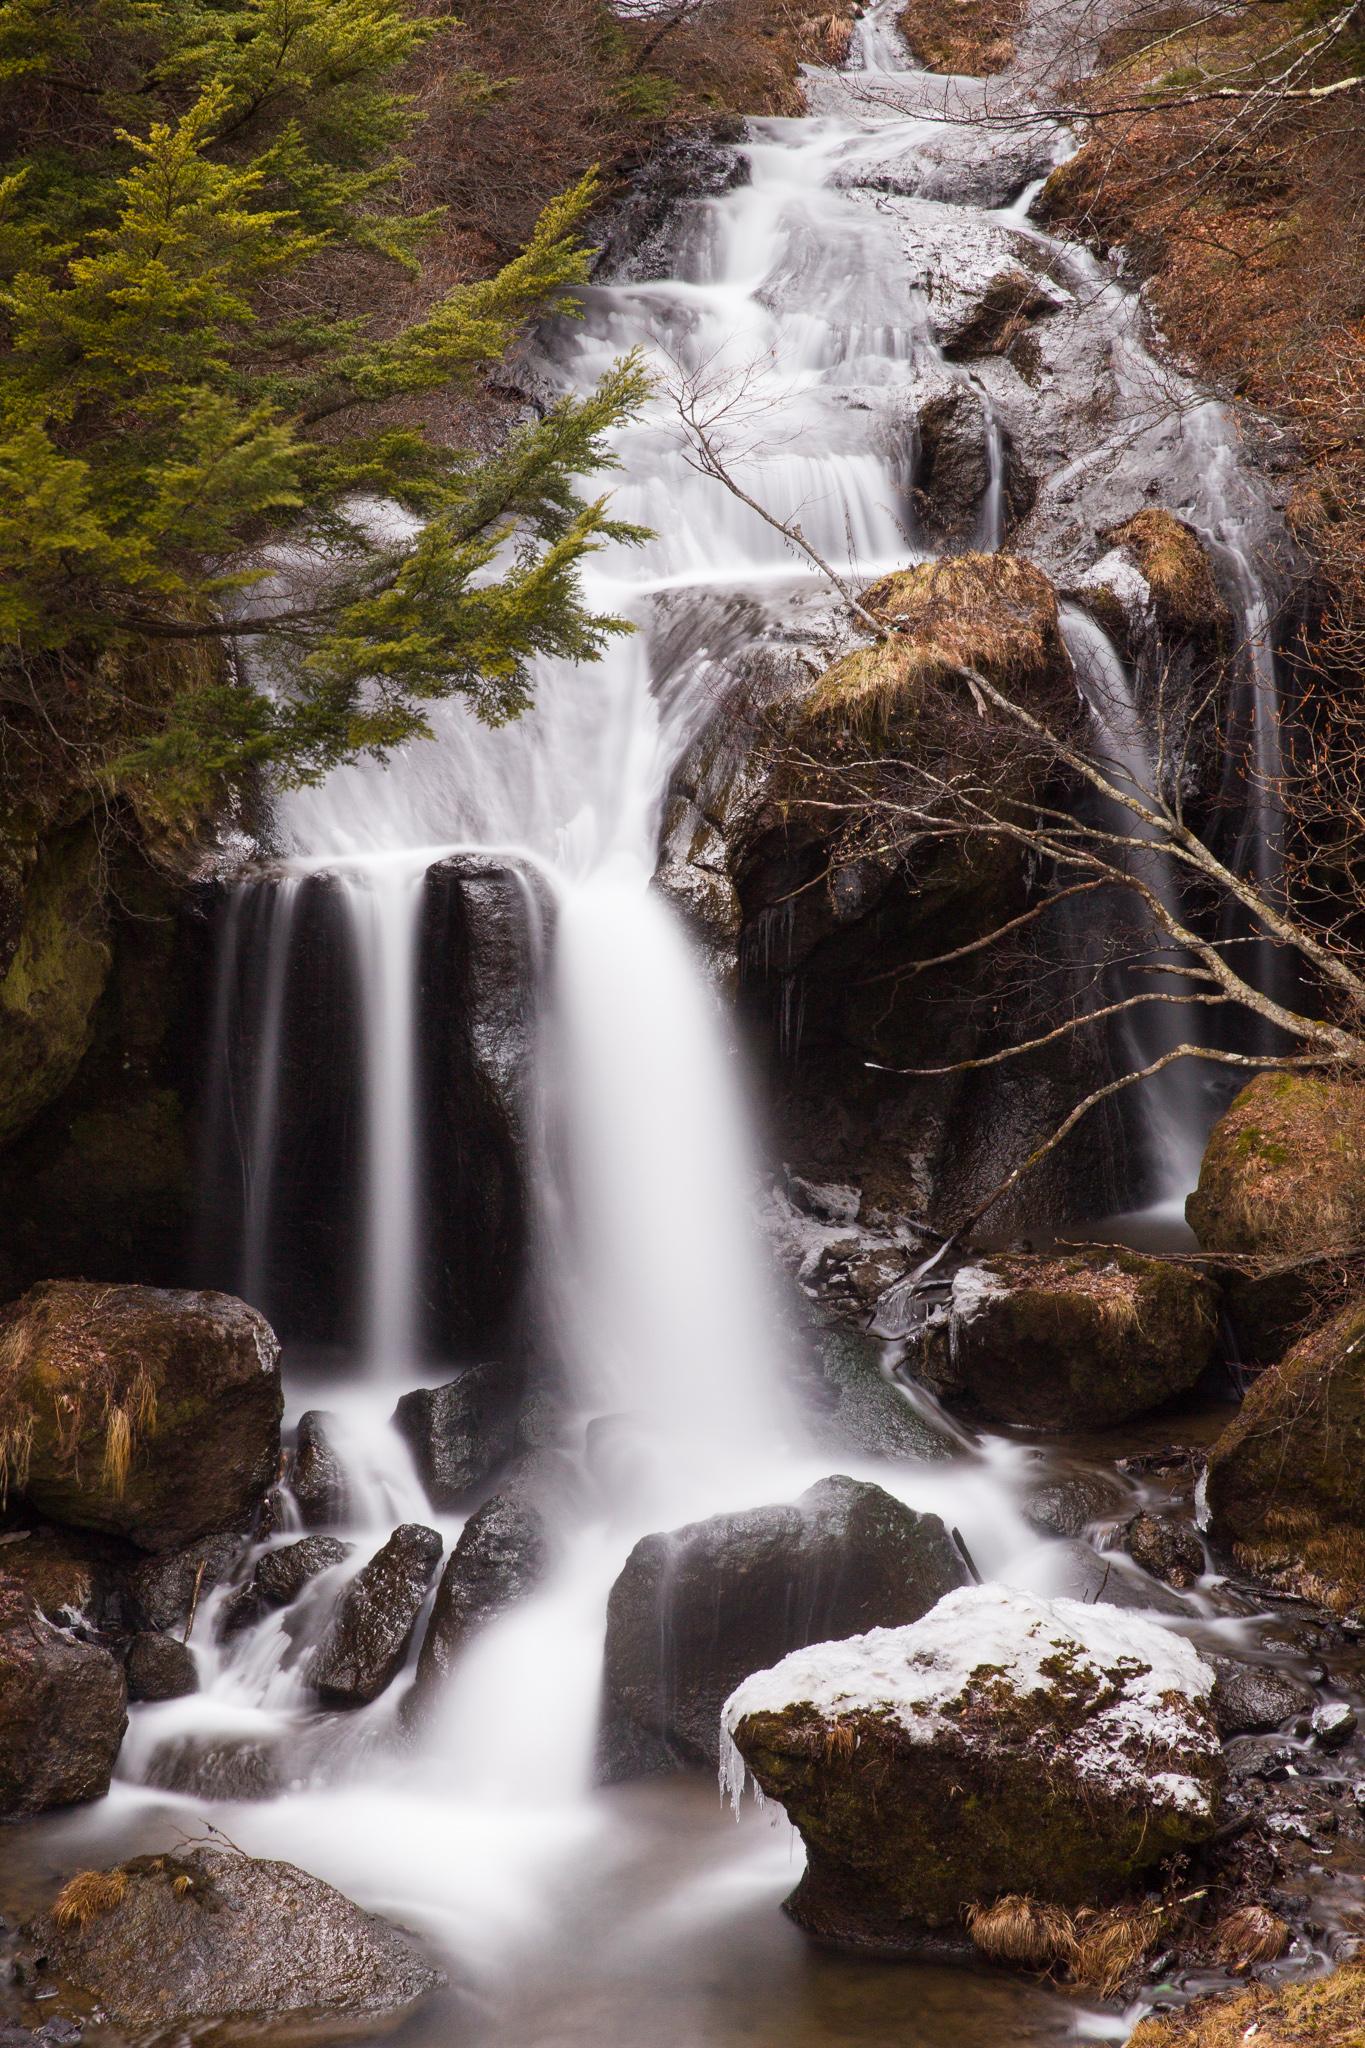 6651-japan-nature-waterfall.jpg